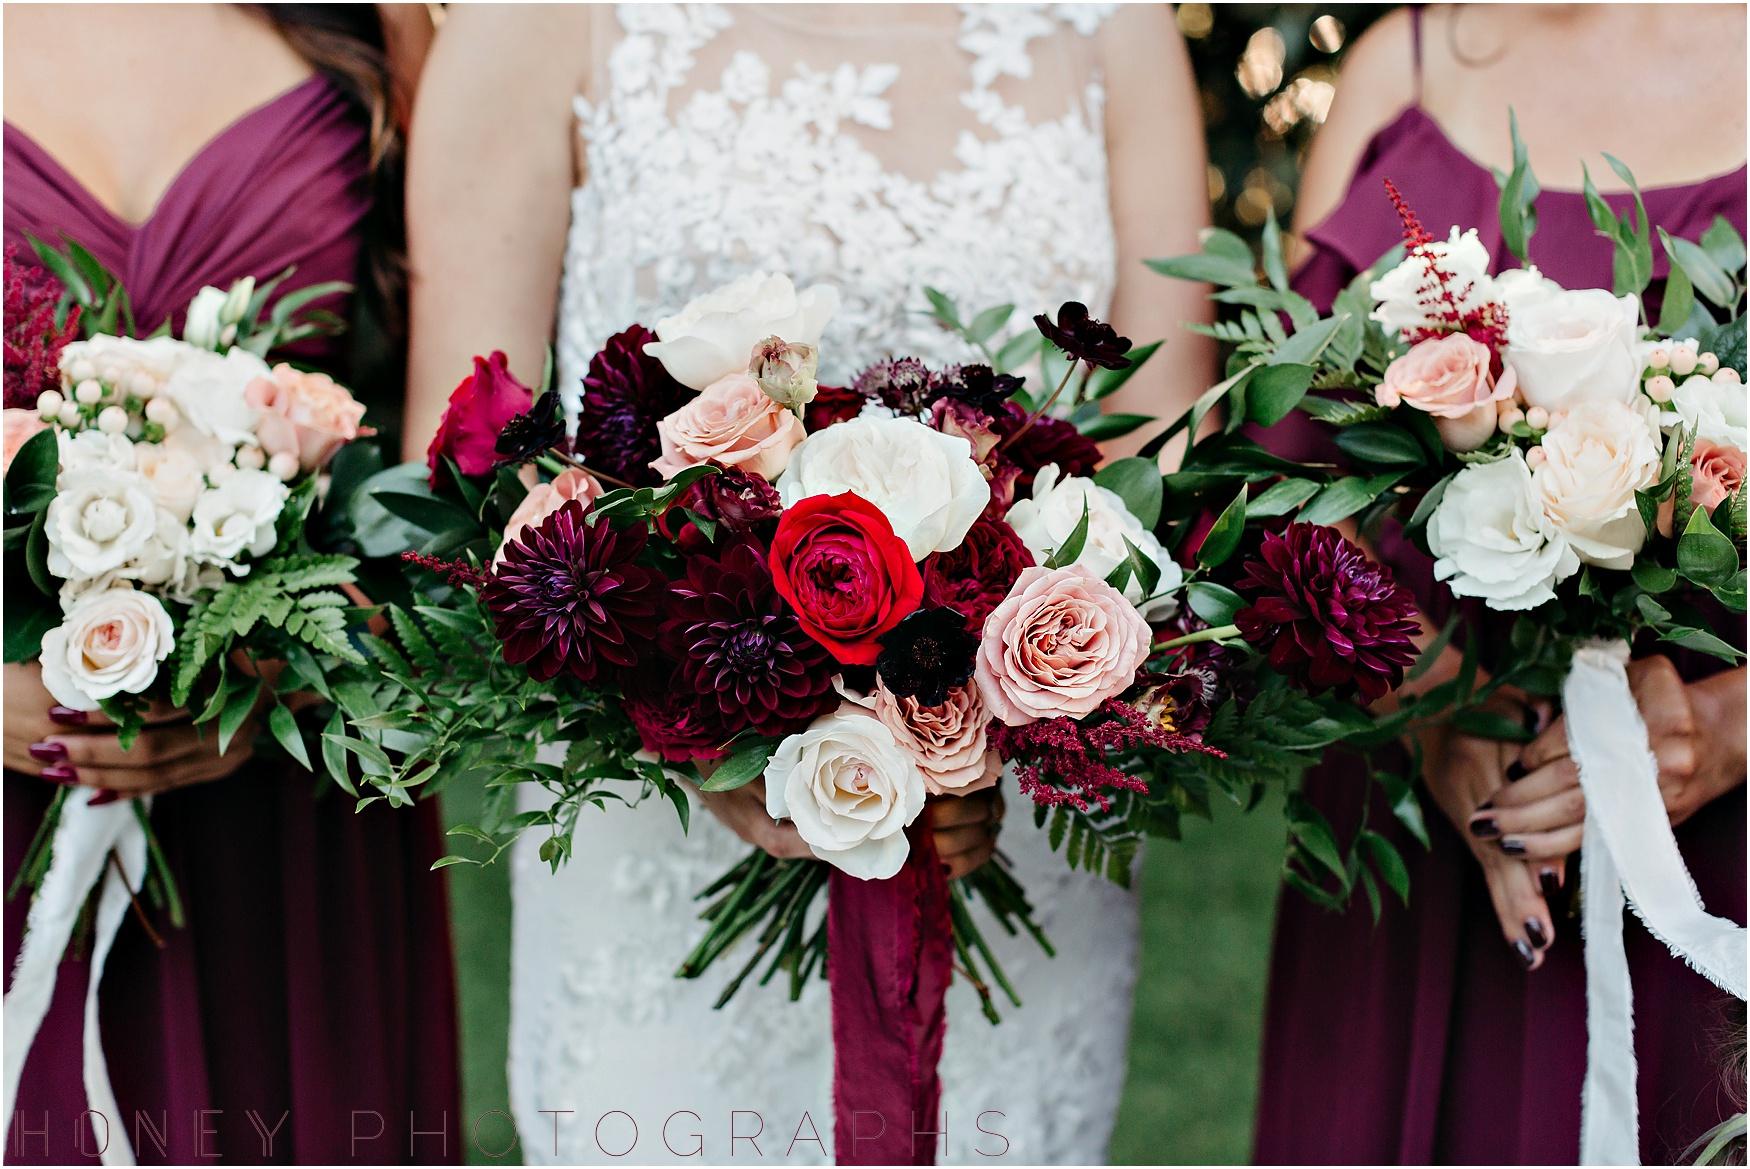 twin_oaks_garden_estate_fall_winter_burgundy_wedding009.jpg